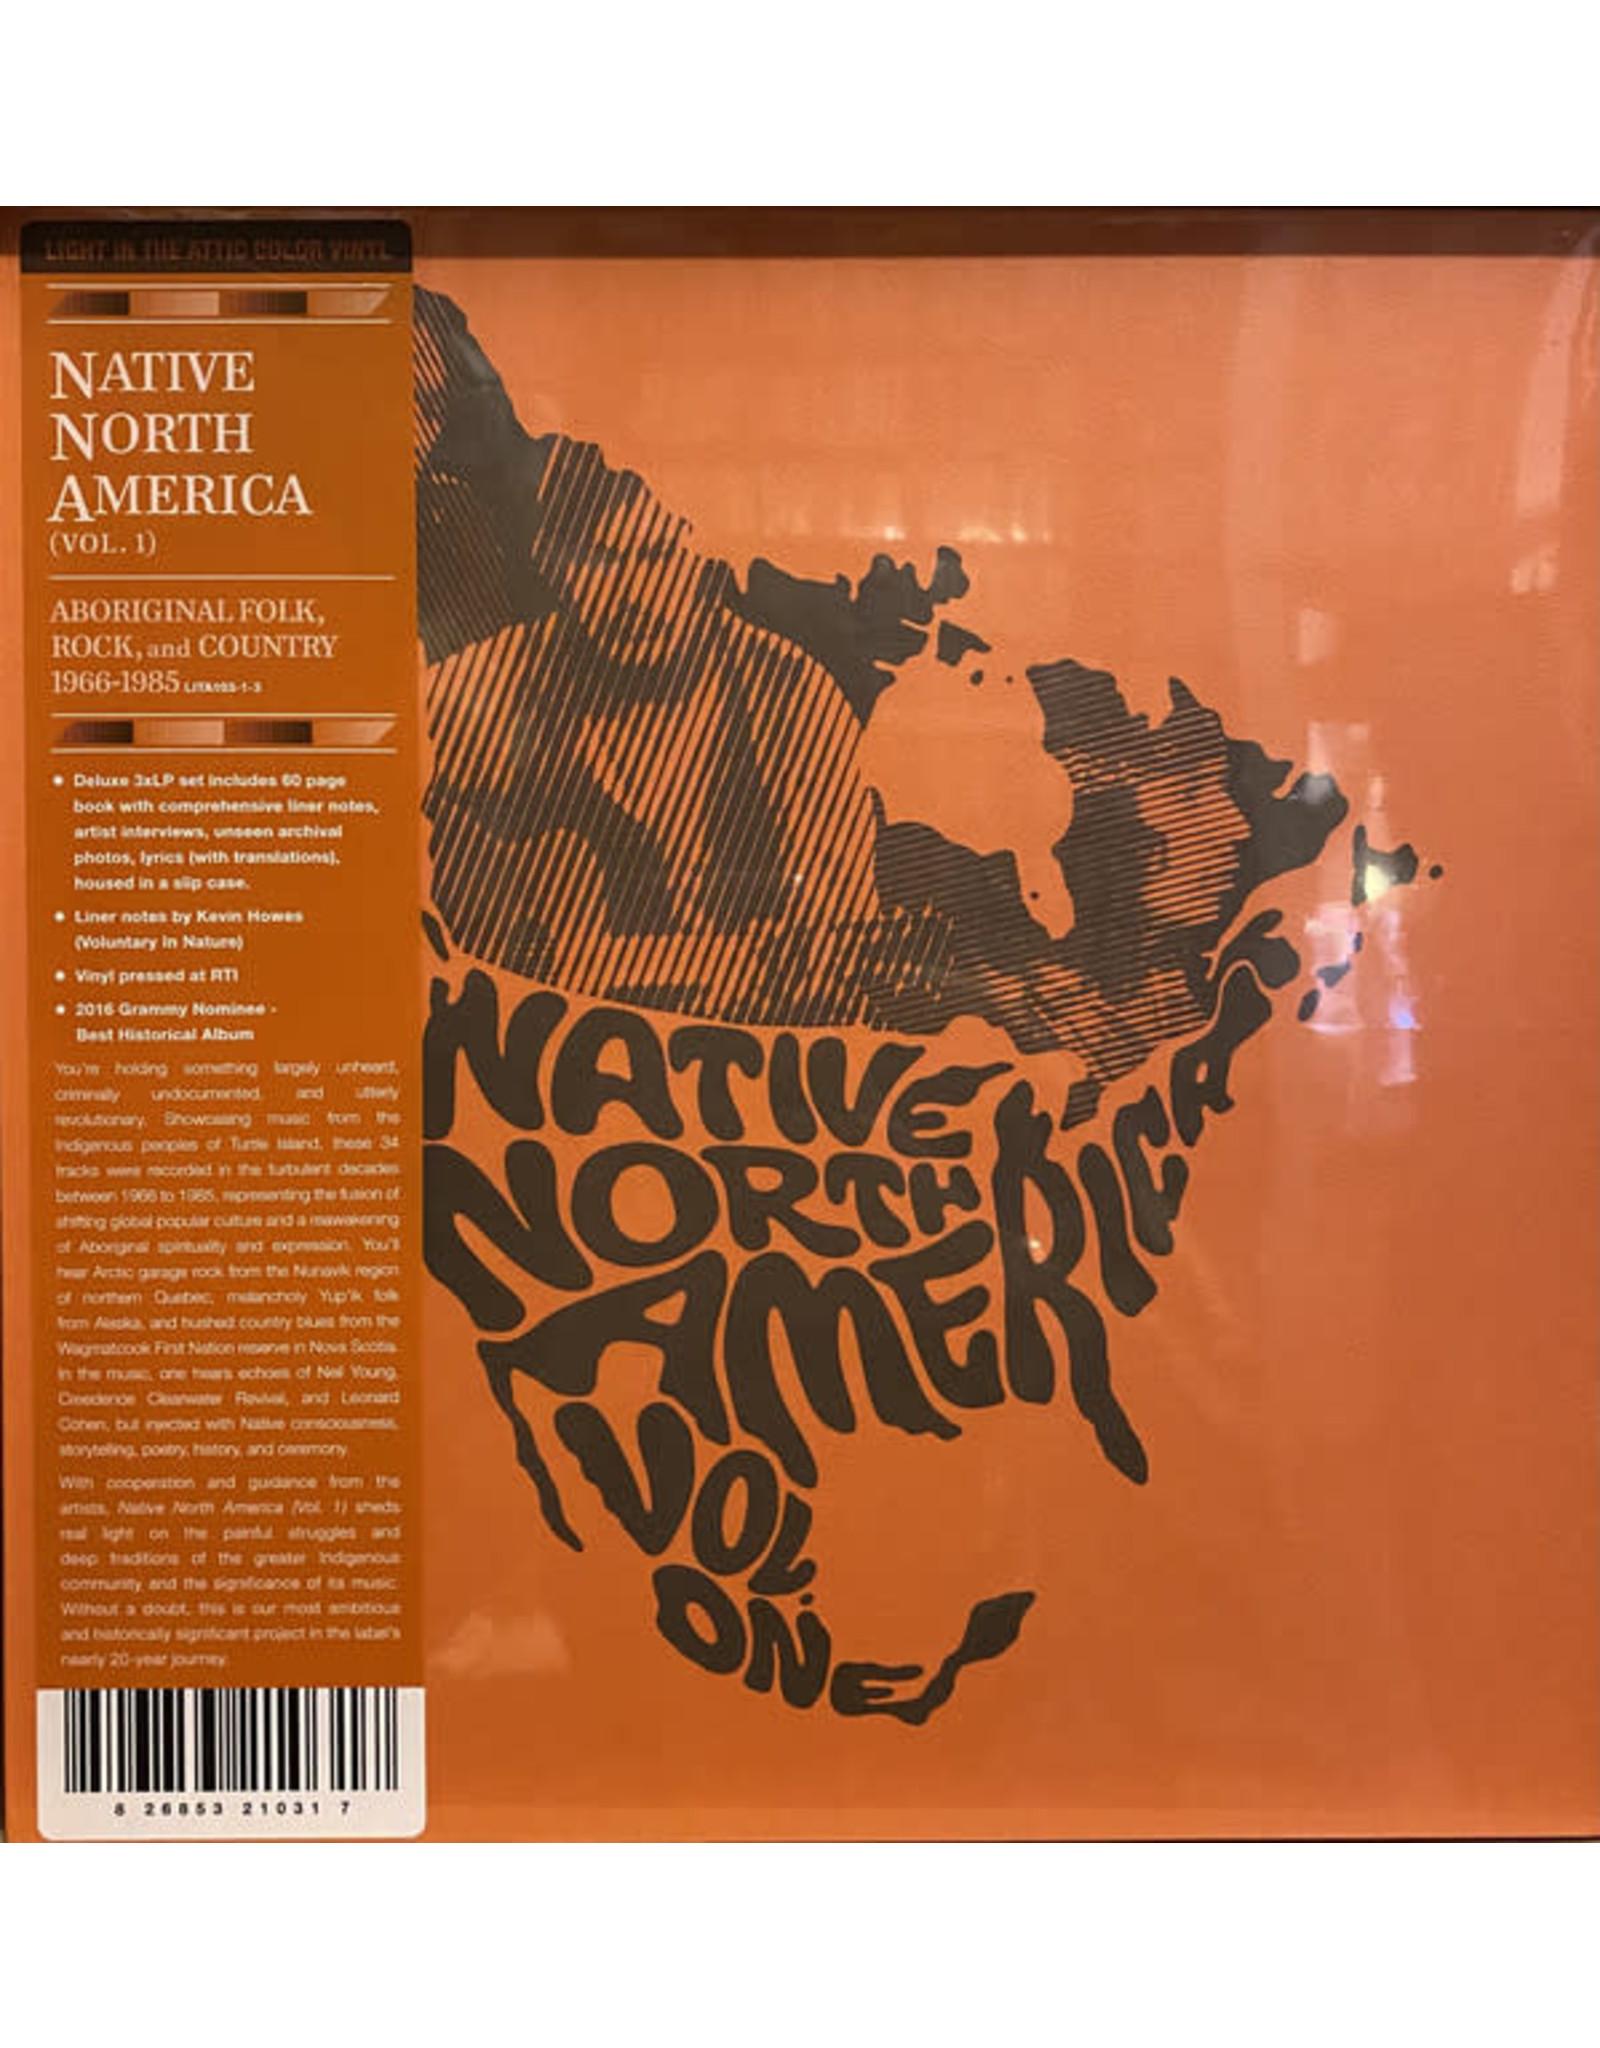 Native North America Volume 1 - Aboriginal, Folk, Rock and Country LP (3LP Coloured Vinyl Boxset with Book)